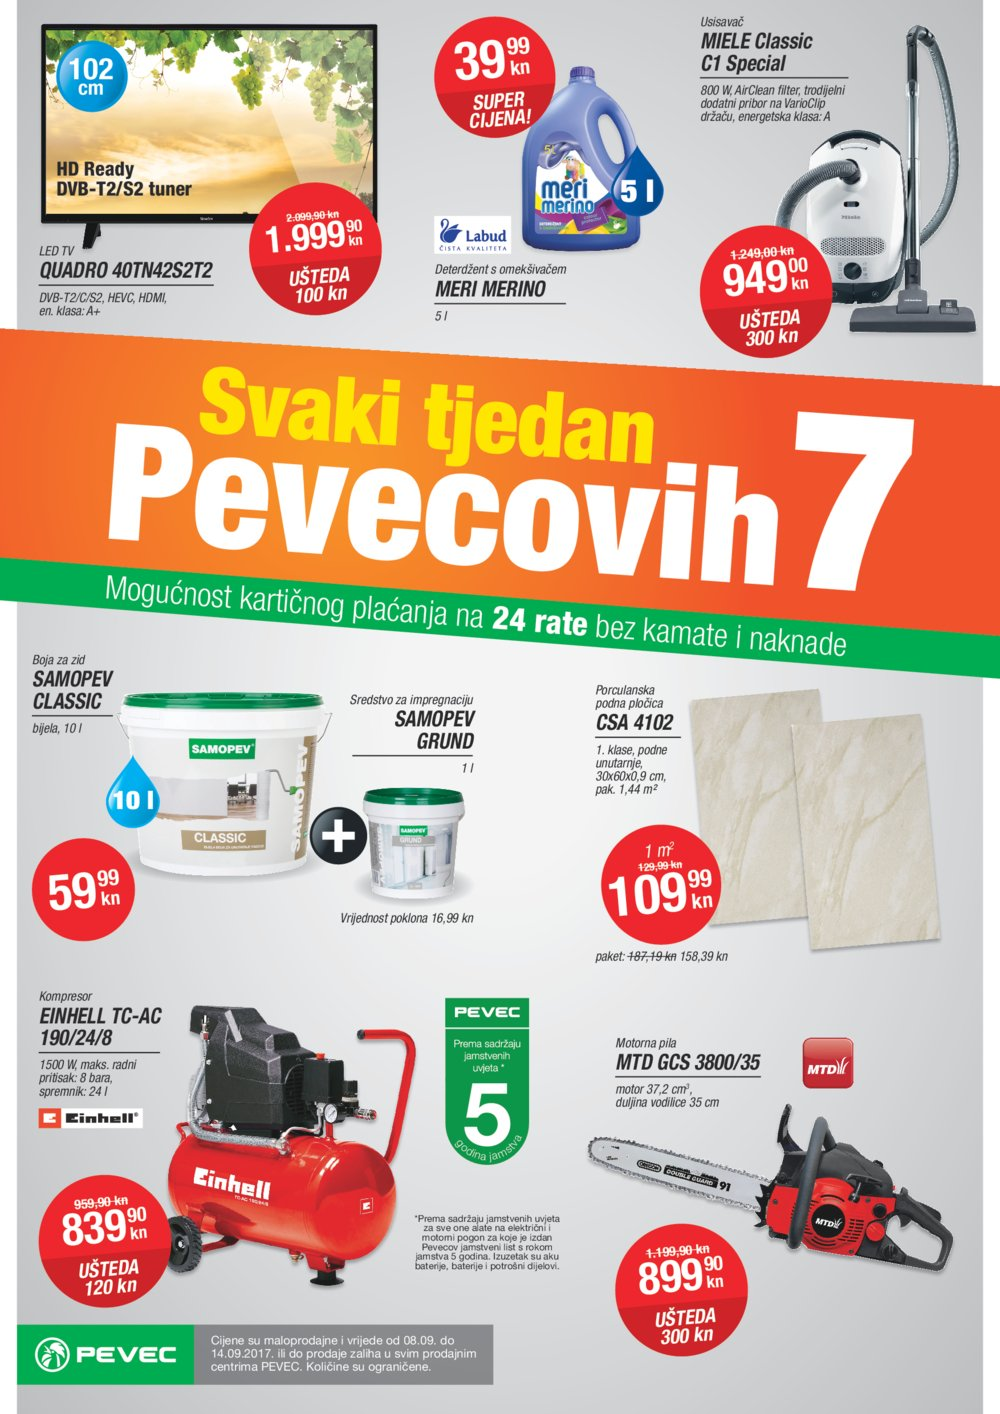 Pevec letak Svaki tjedan Pevecovih 7 08.09.-14.09.2017.